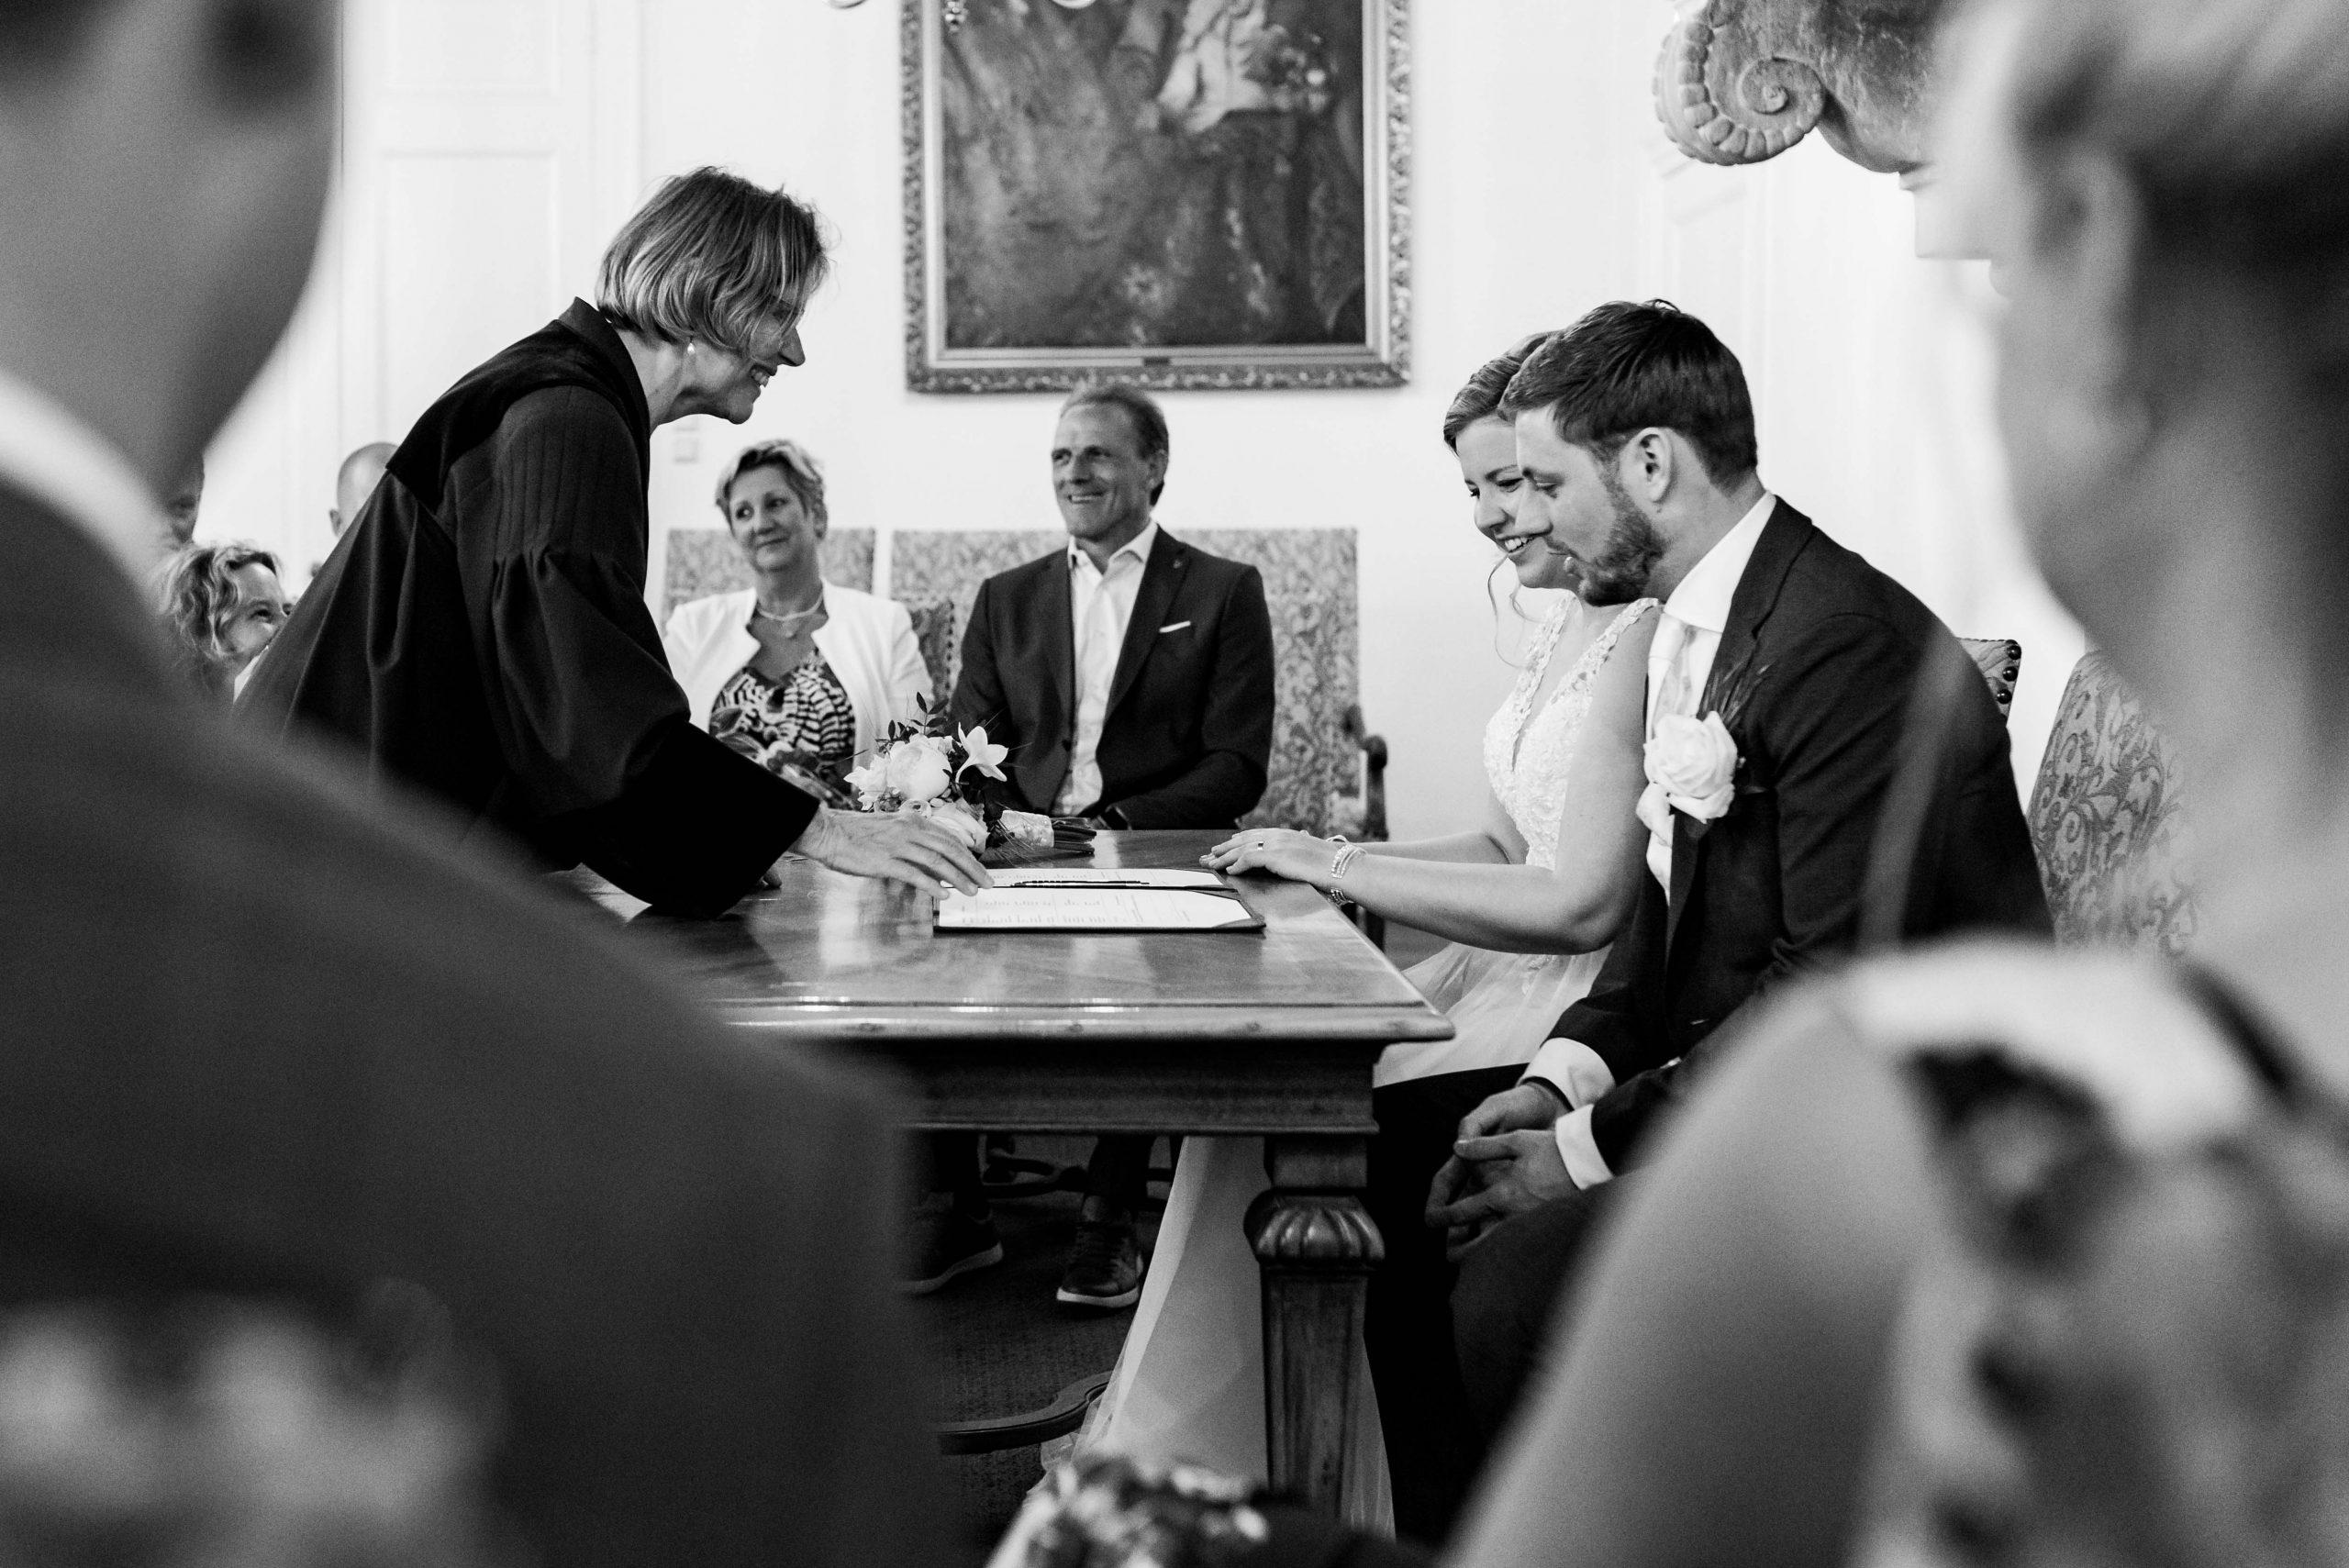 Bruid en bruidegom tekenen de akte